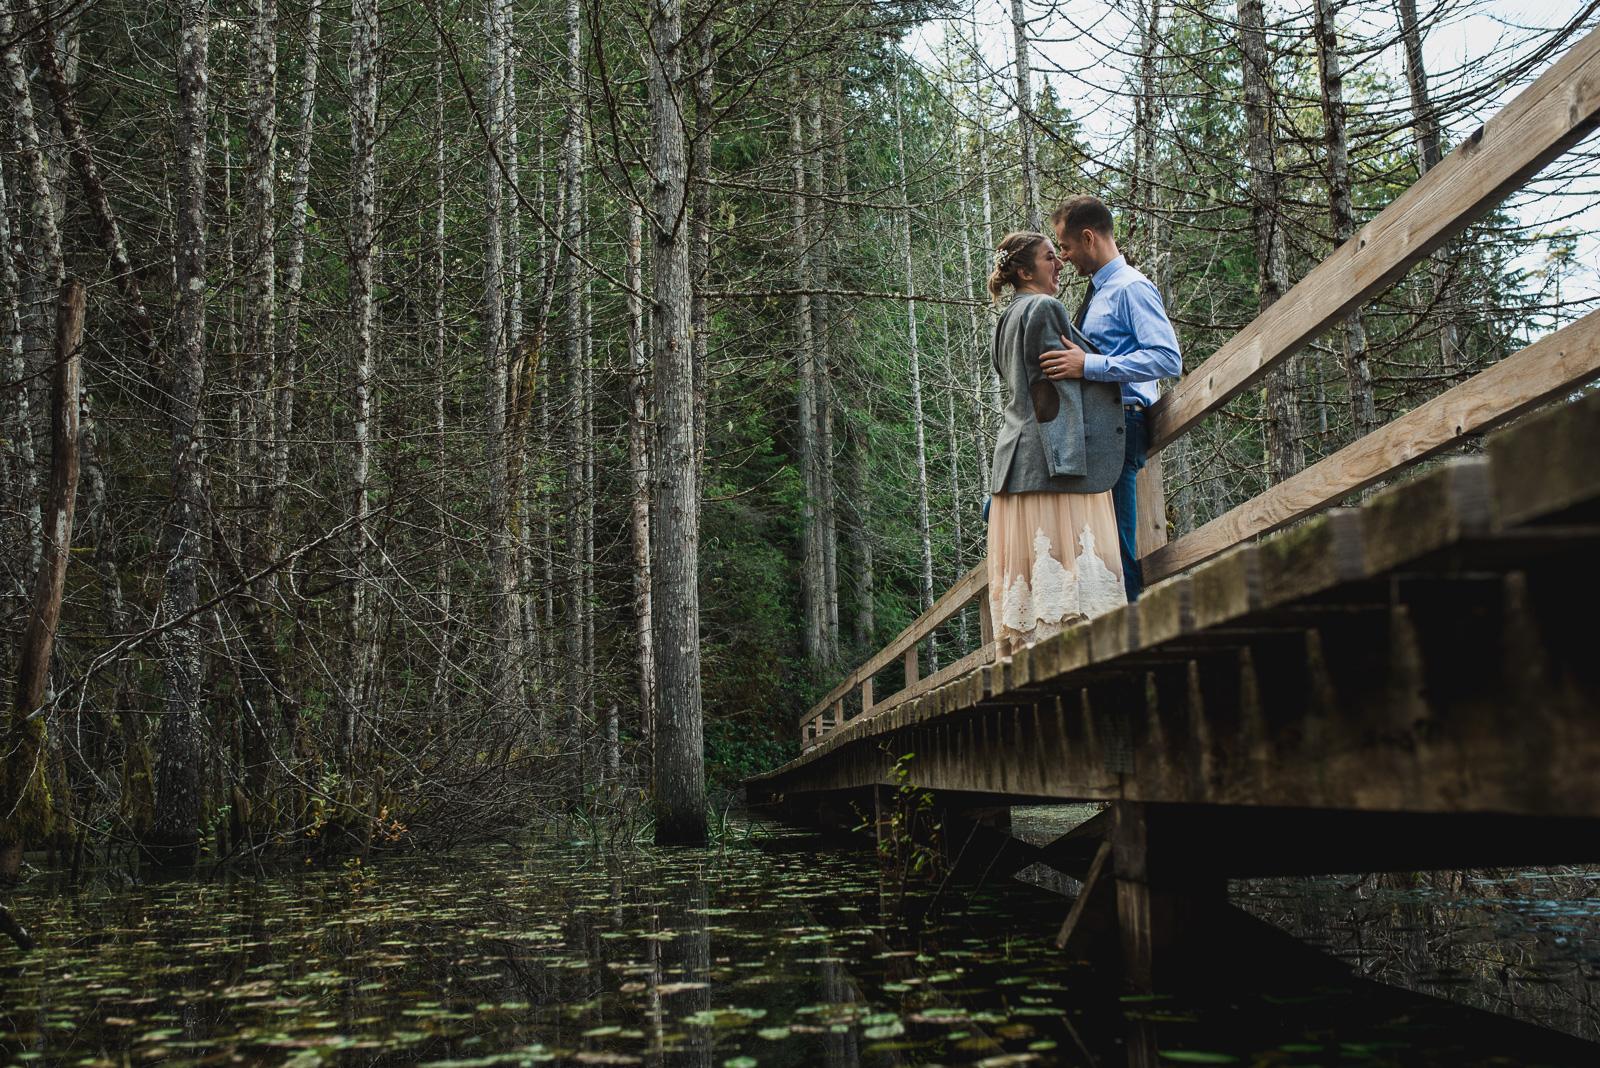 vancouver-island-wedding-photographers-cliff-gilker-park-smugglers-cove-elopement-24.jpg